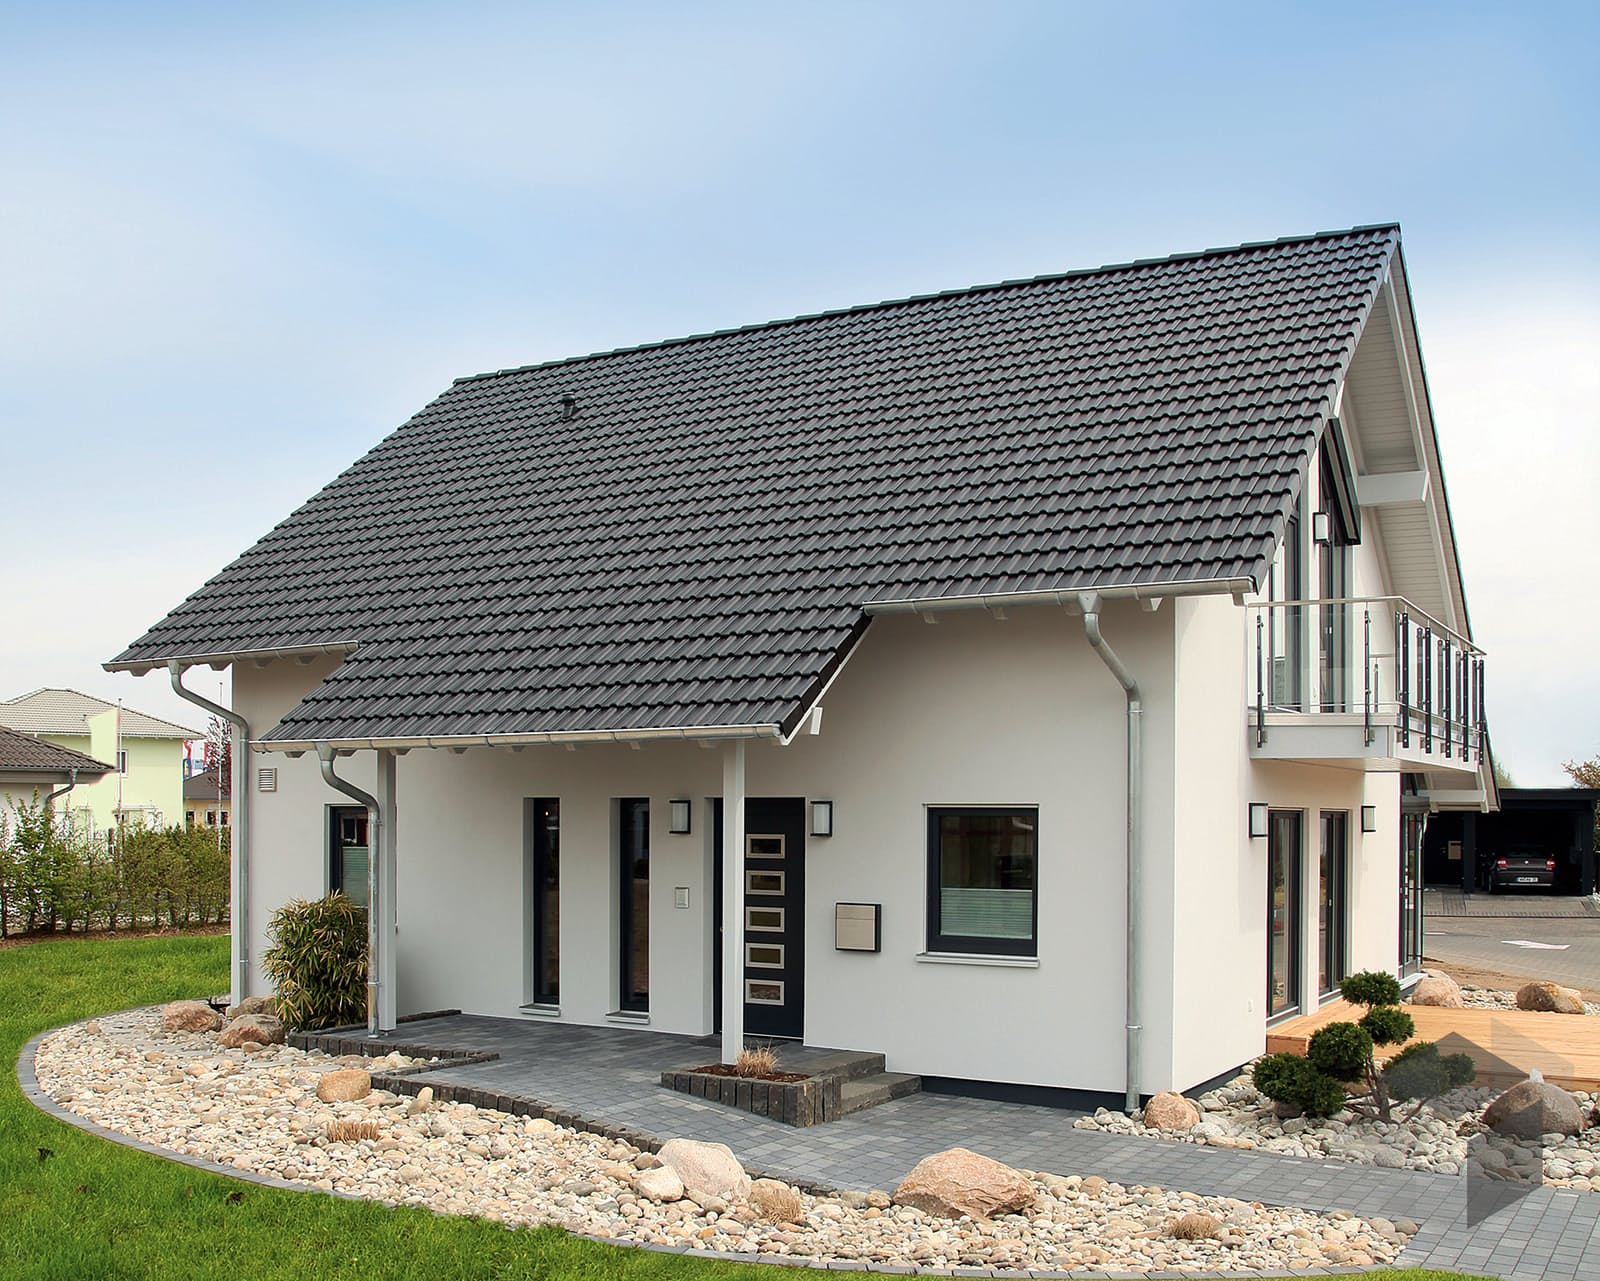 medley 410 se inactive von fingerhaus komplette daten bersicht. Black Bedroom Furniture Sets. Home Design Ideas